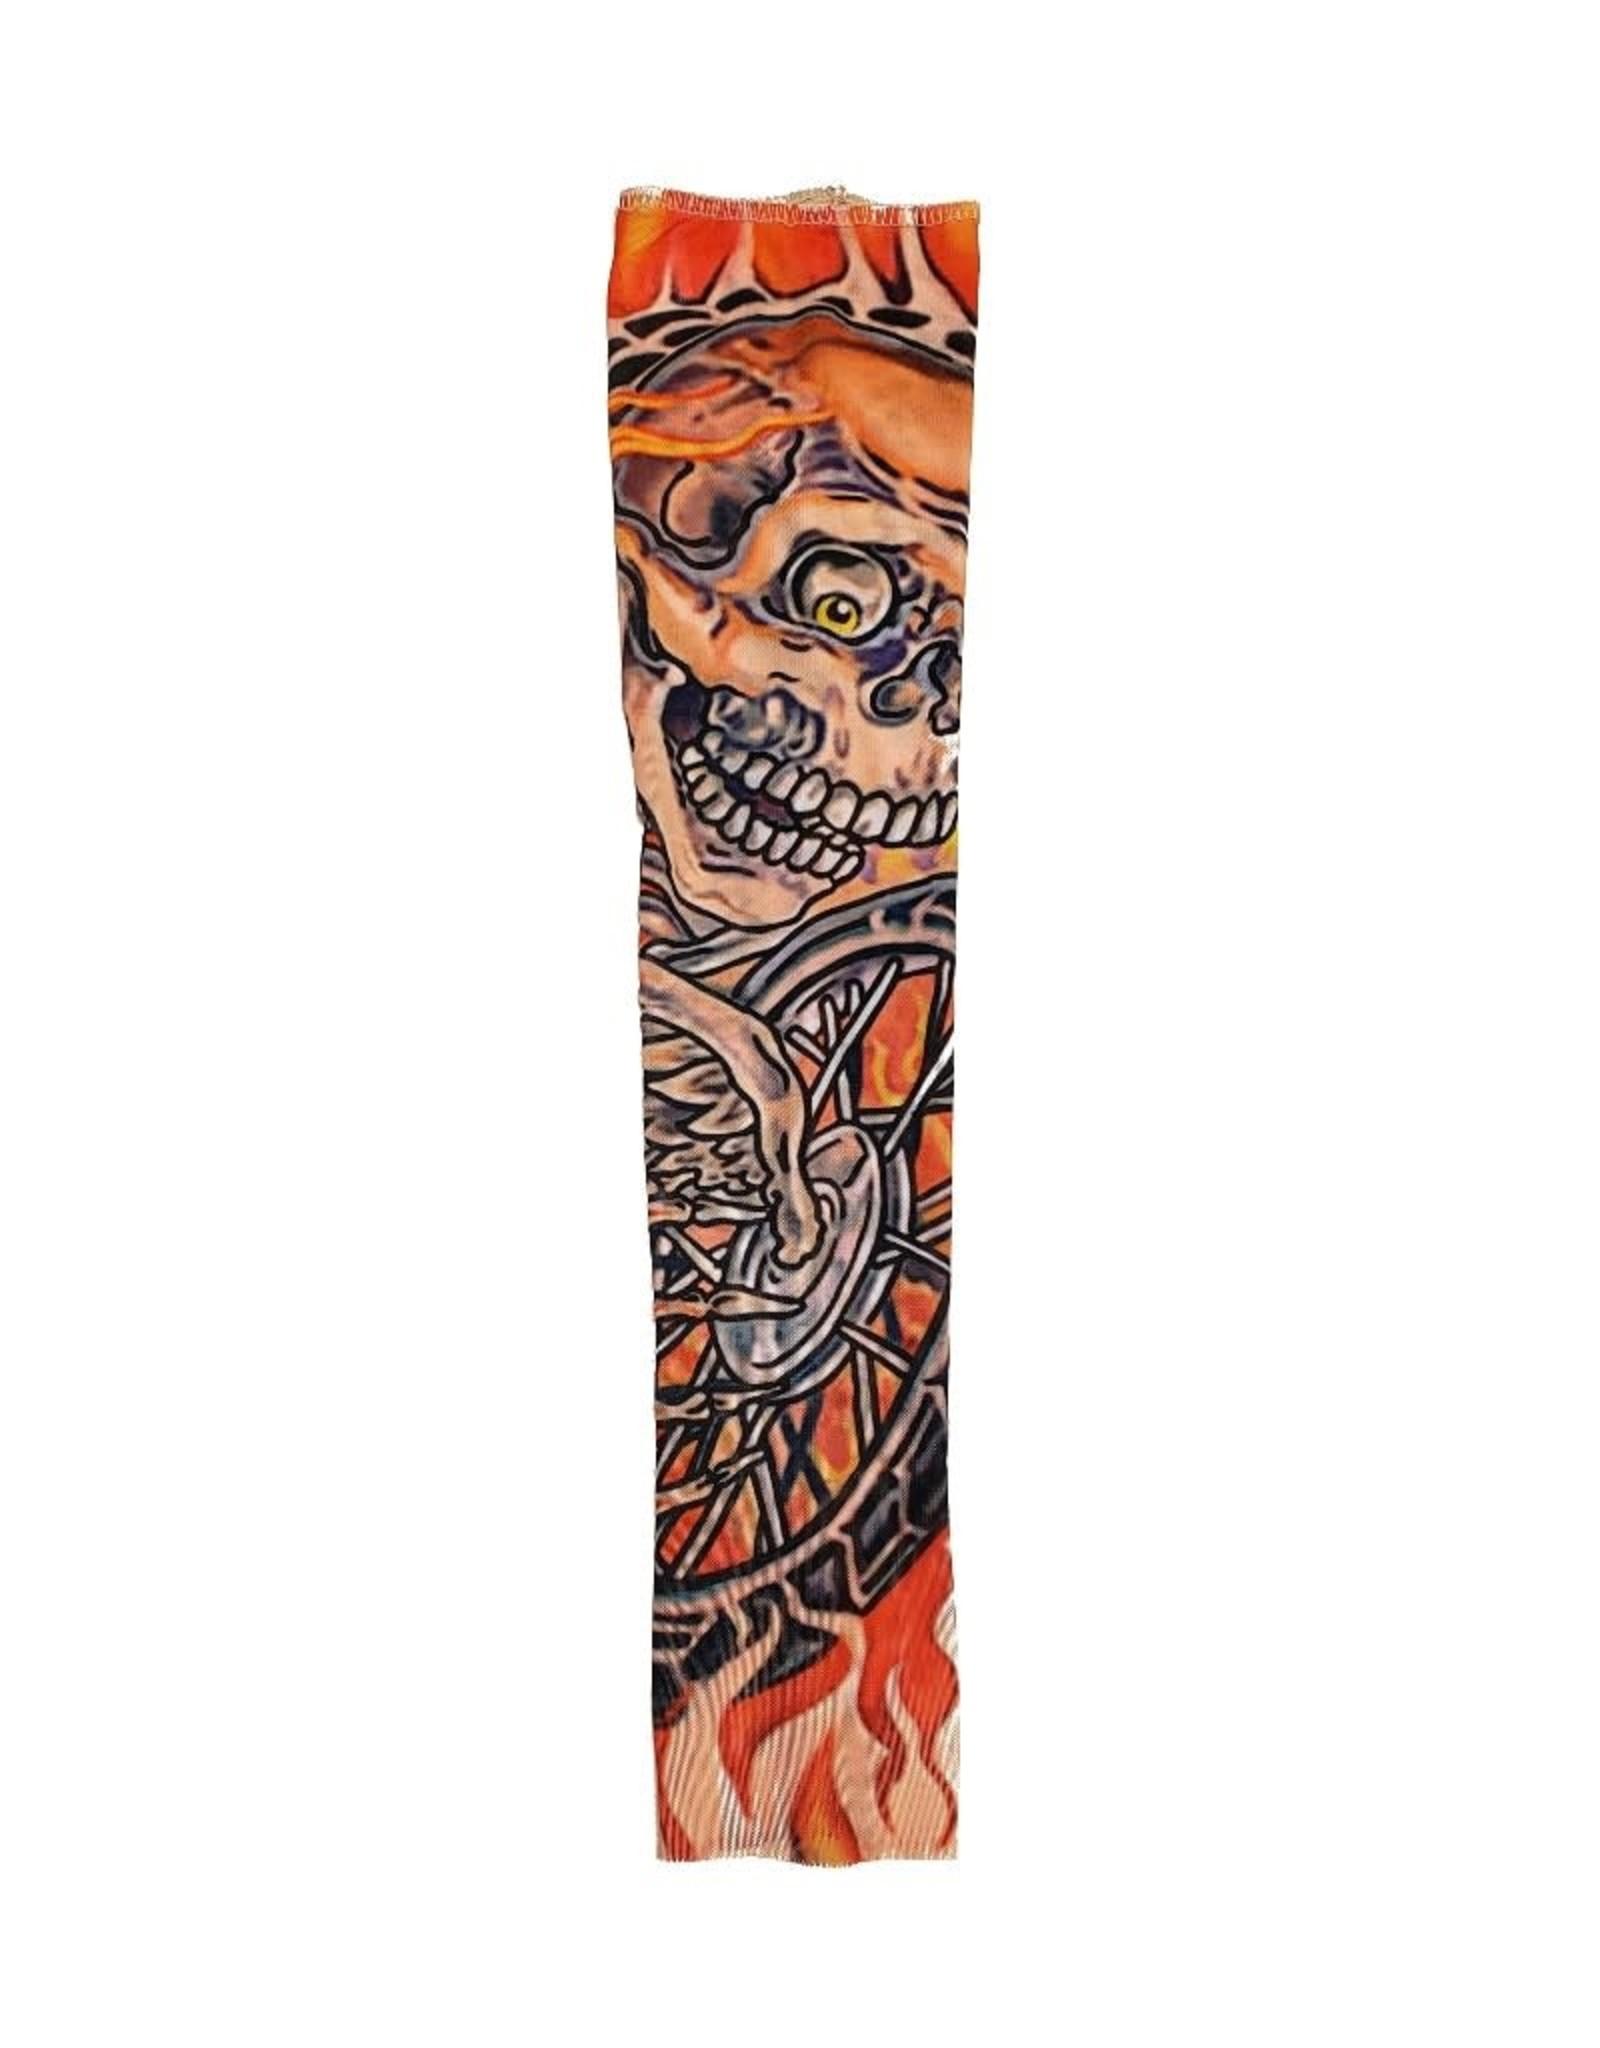 Tito Halloween Tattoo Sleeves